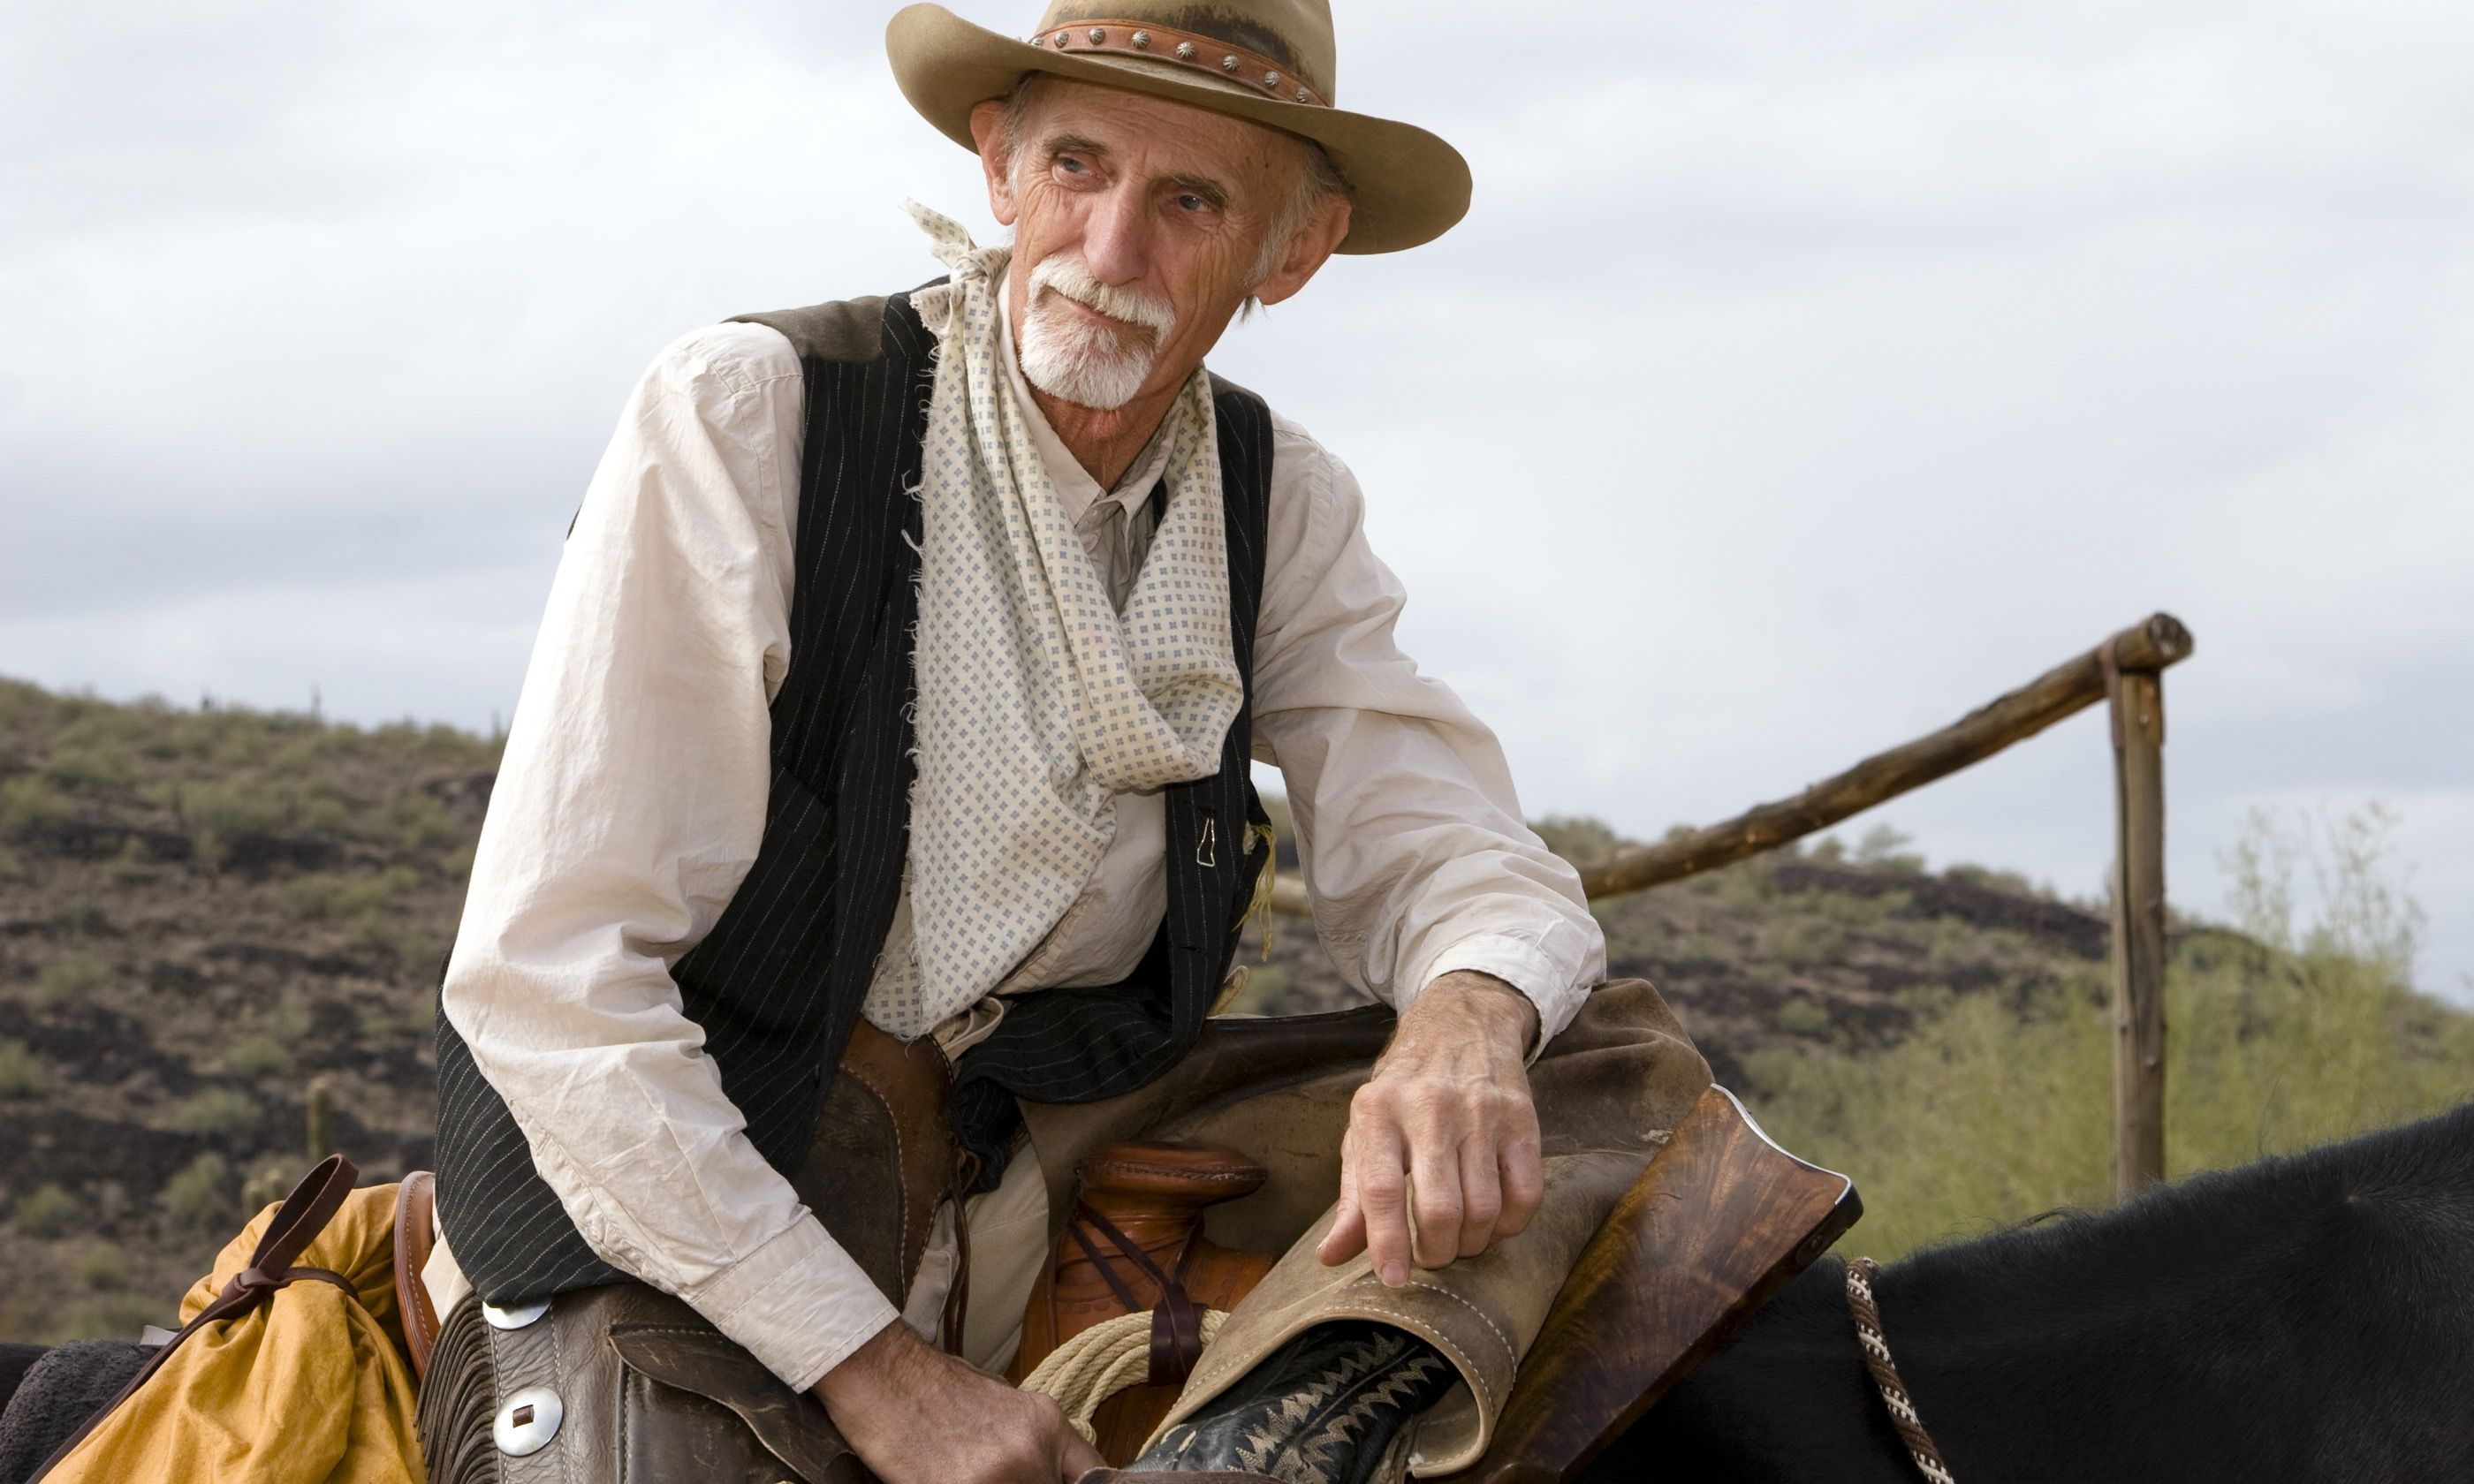 A wise old cowboy (Dreamstime)